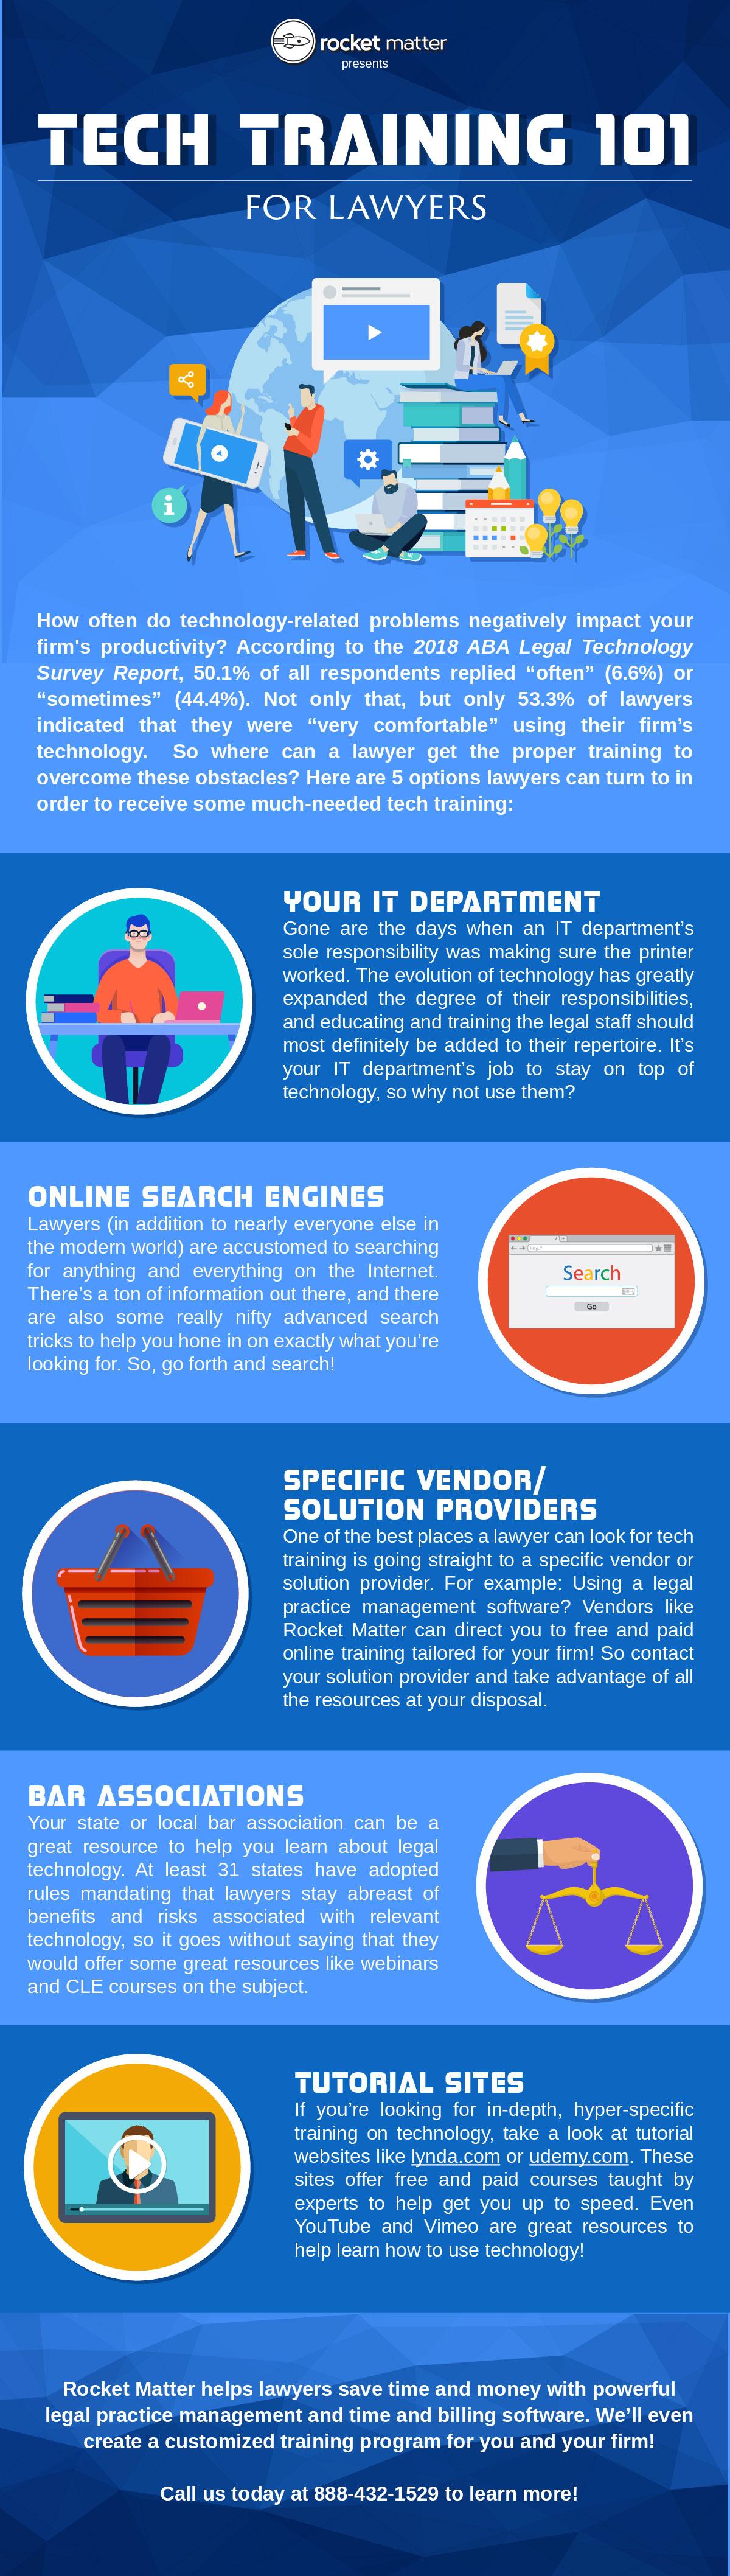 2019-02-15-tech-training-infographic-01